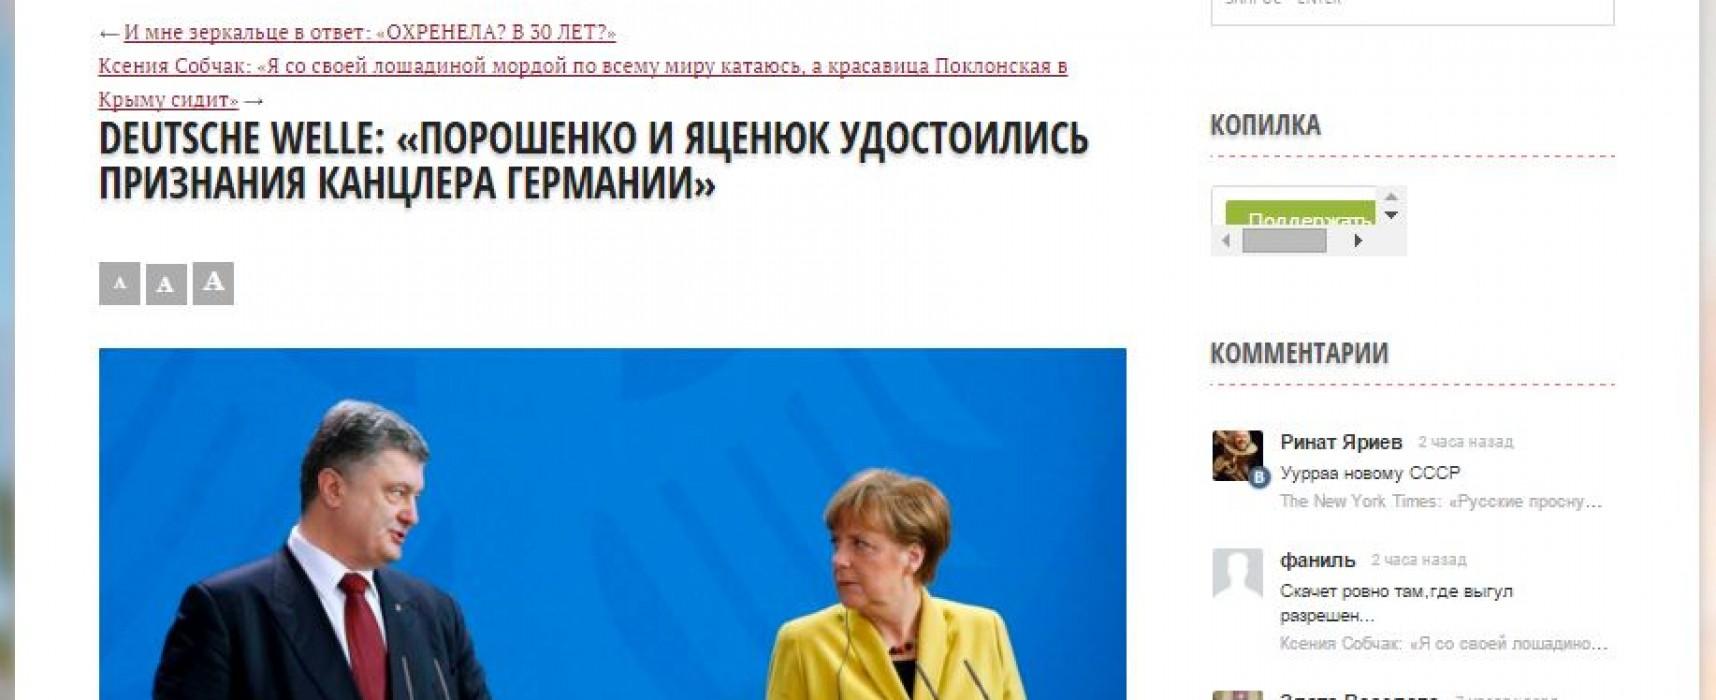 Falso: Merkel insultó a Poroshenko y a Yatseniuk